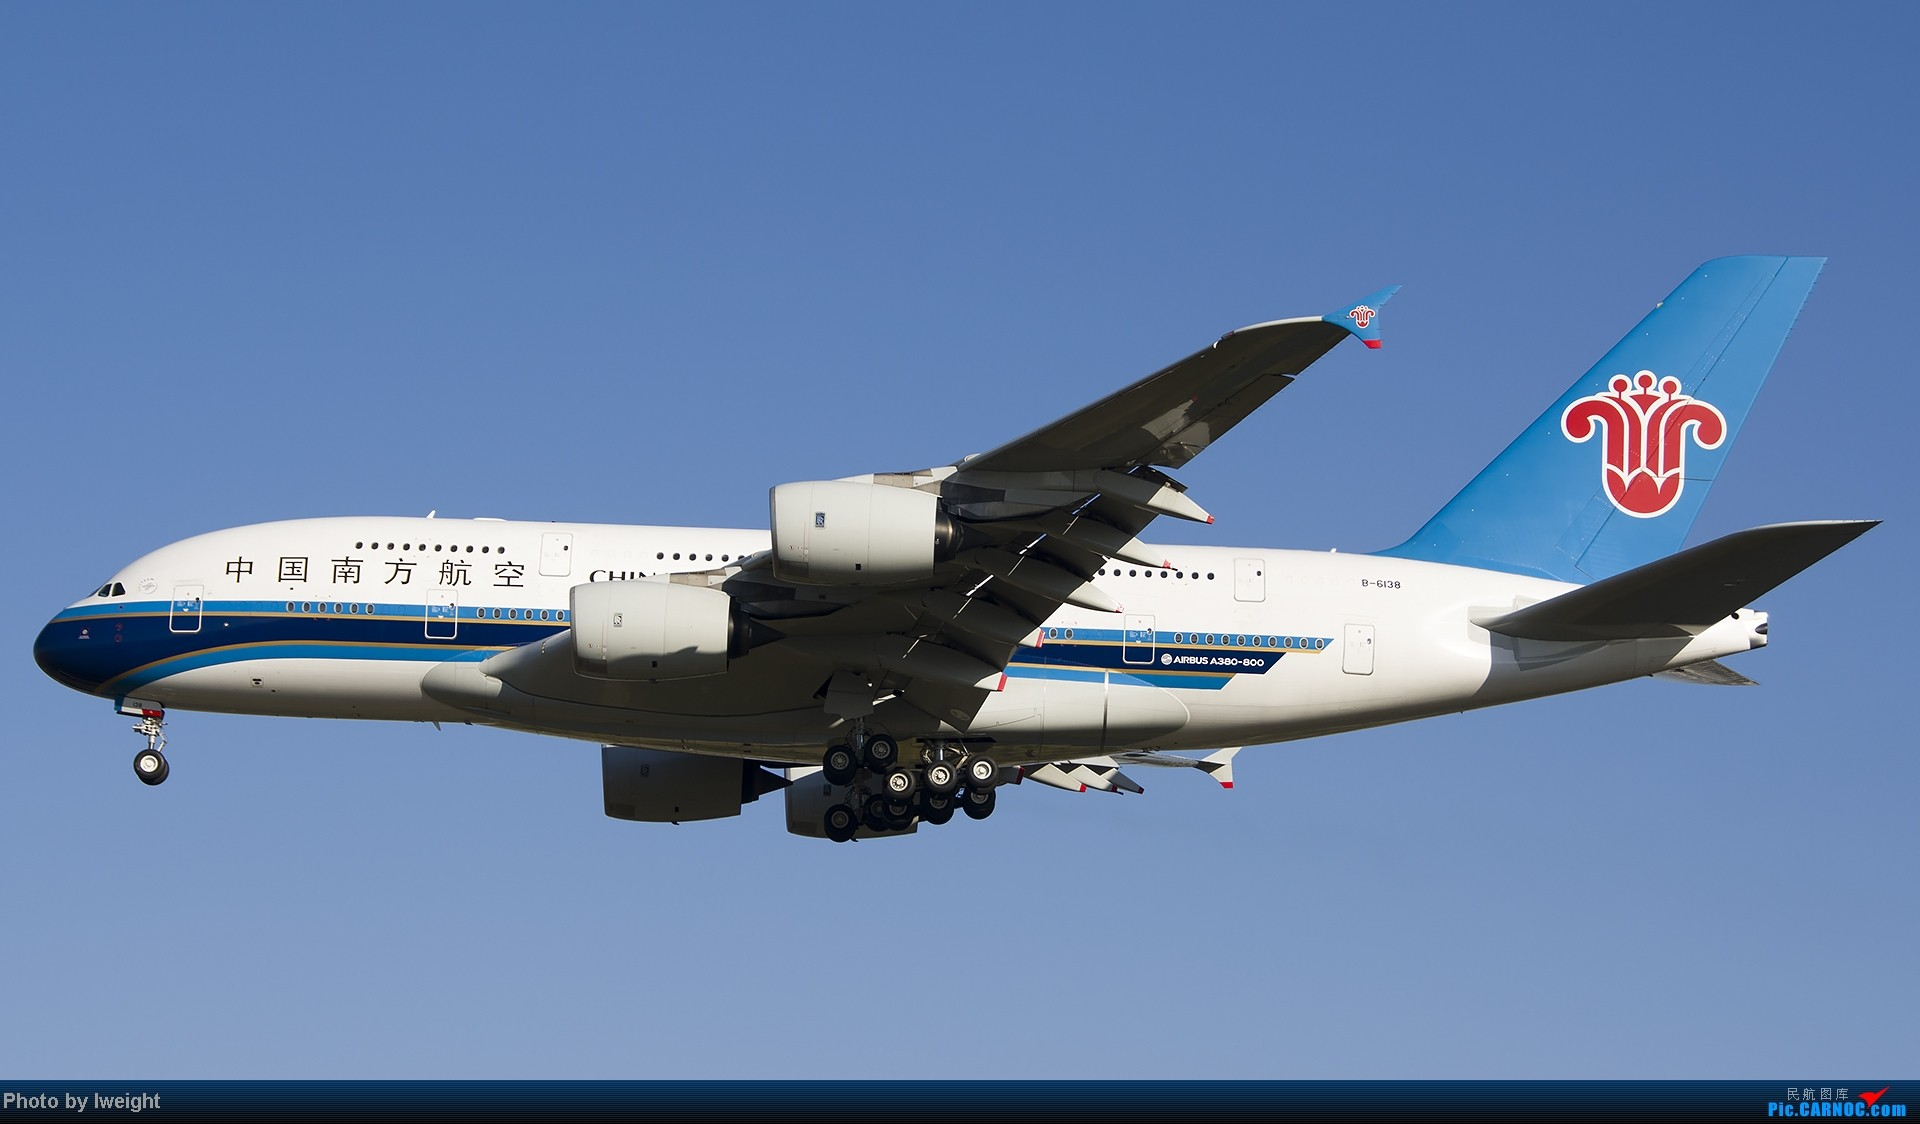 Re:[原创]抓住APEC蓝的尾巴,再拍上一组 AIRBUS A380 B-6138 中国北京首都机场